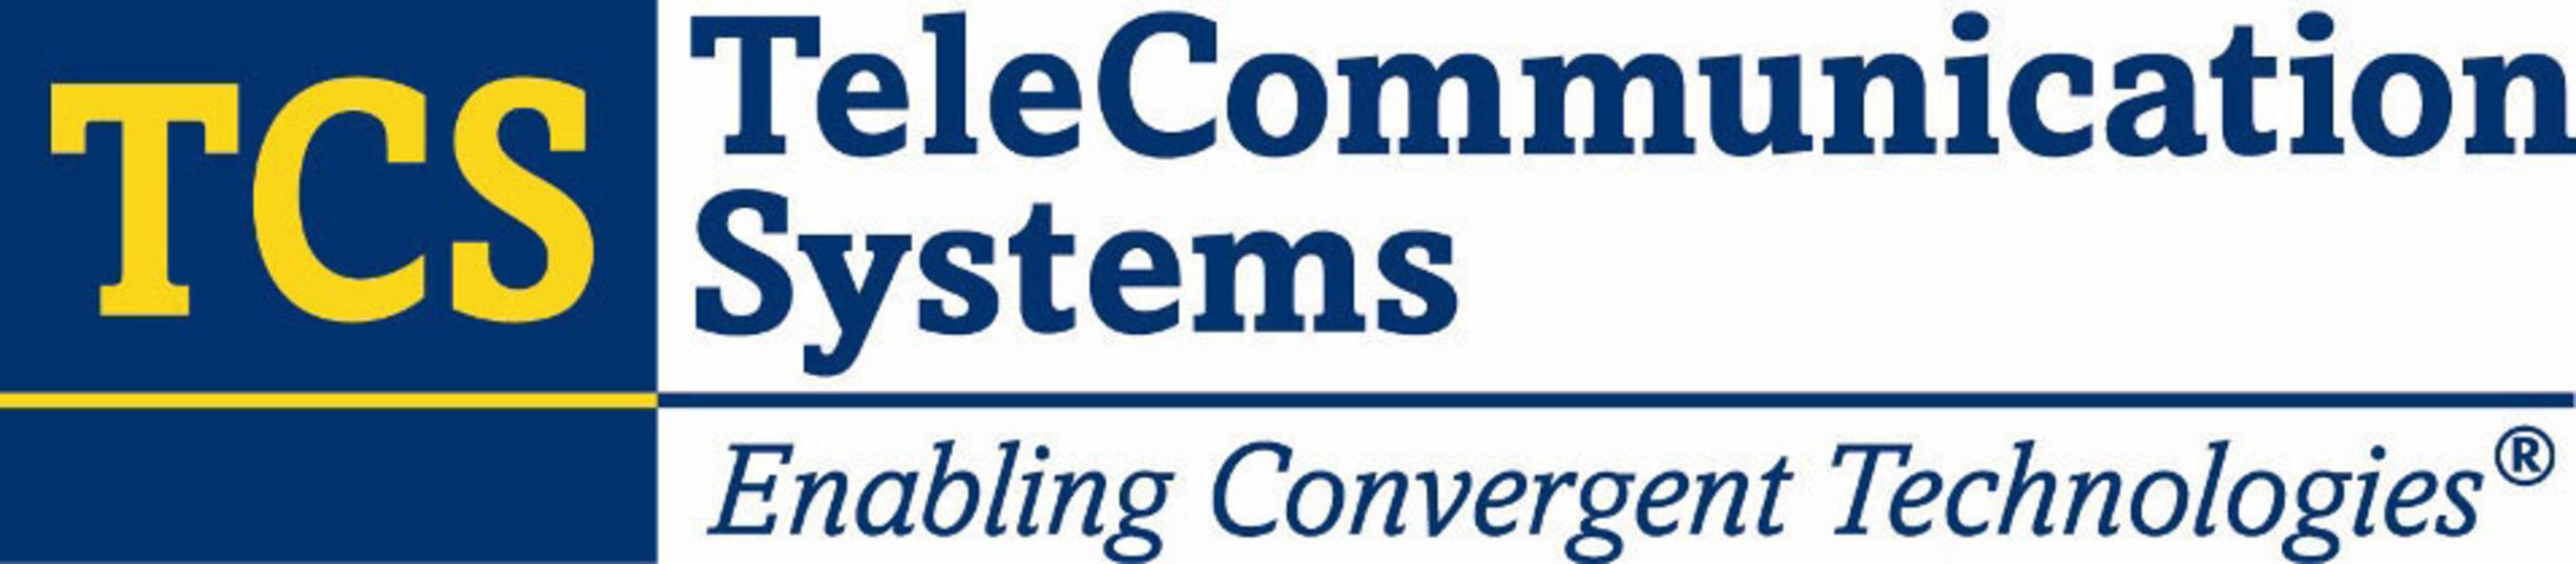 TeleCommunication Systems, Inc. Logo